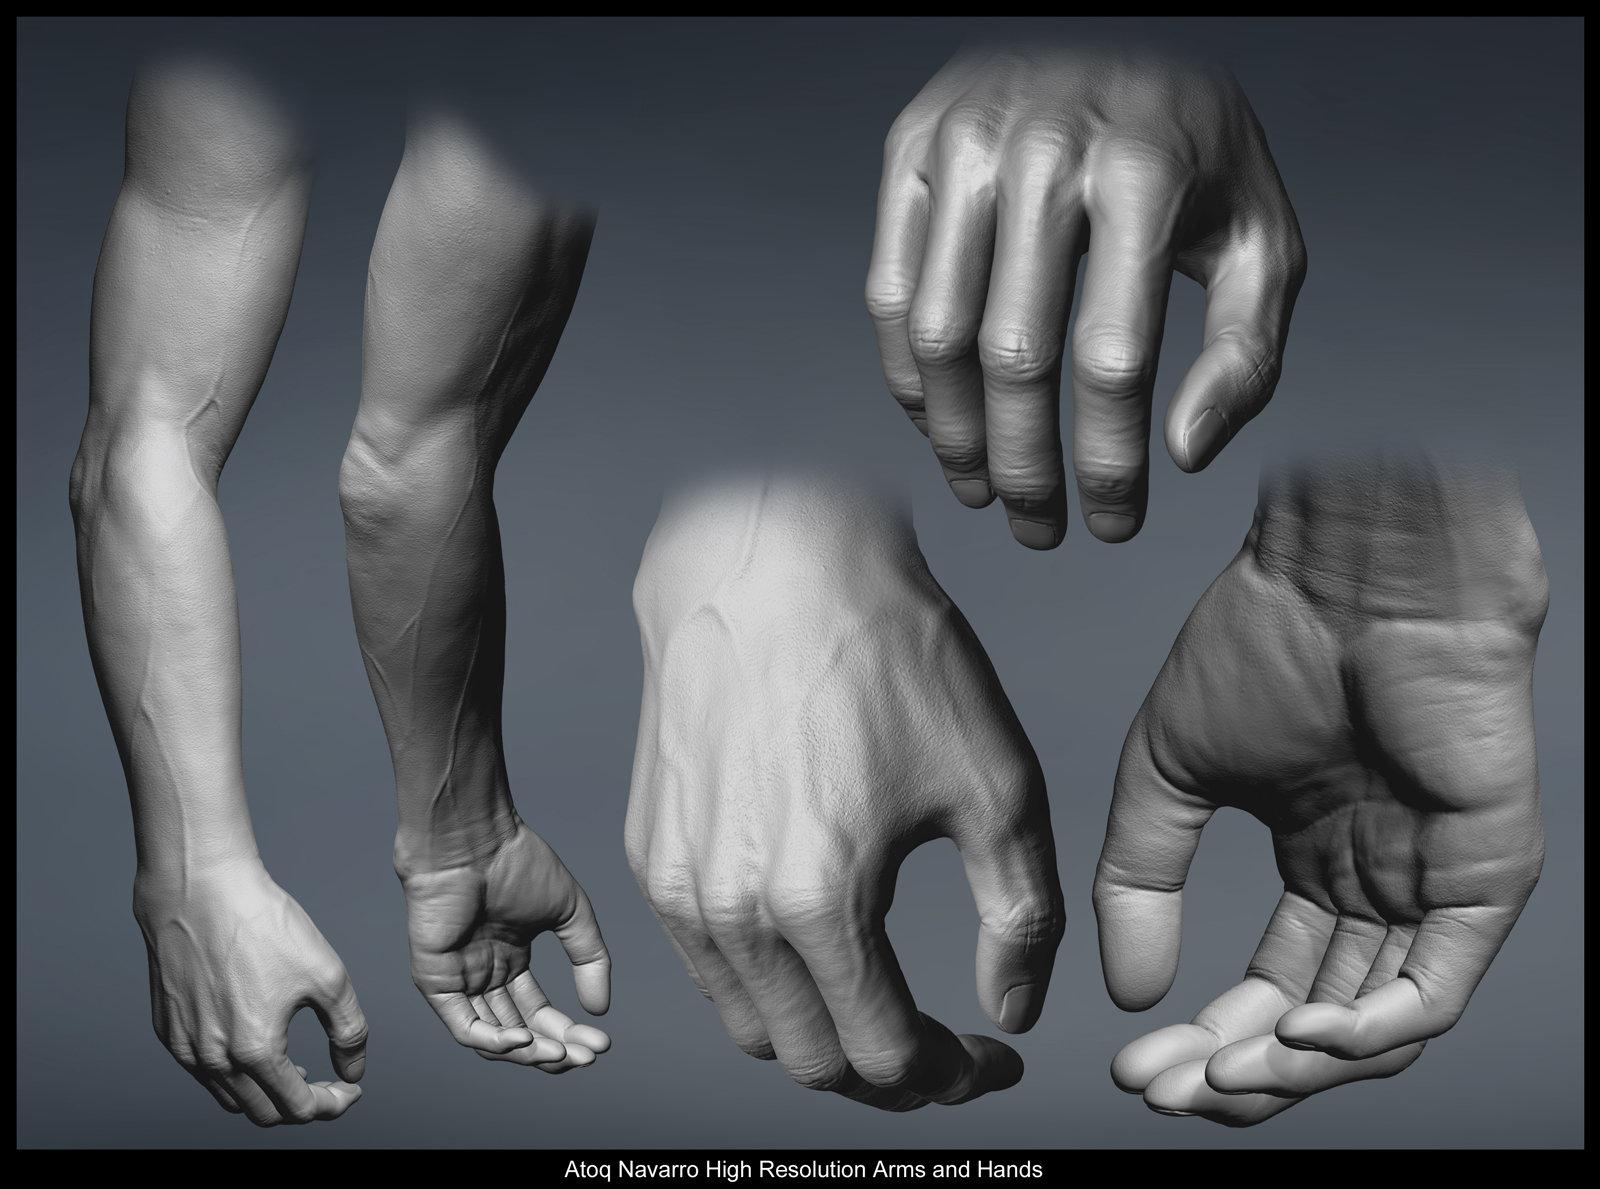 Atoq highres arms